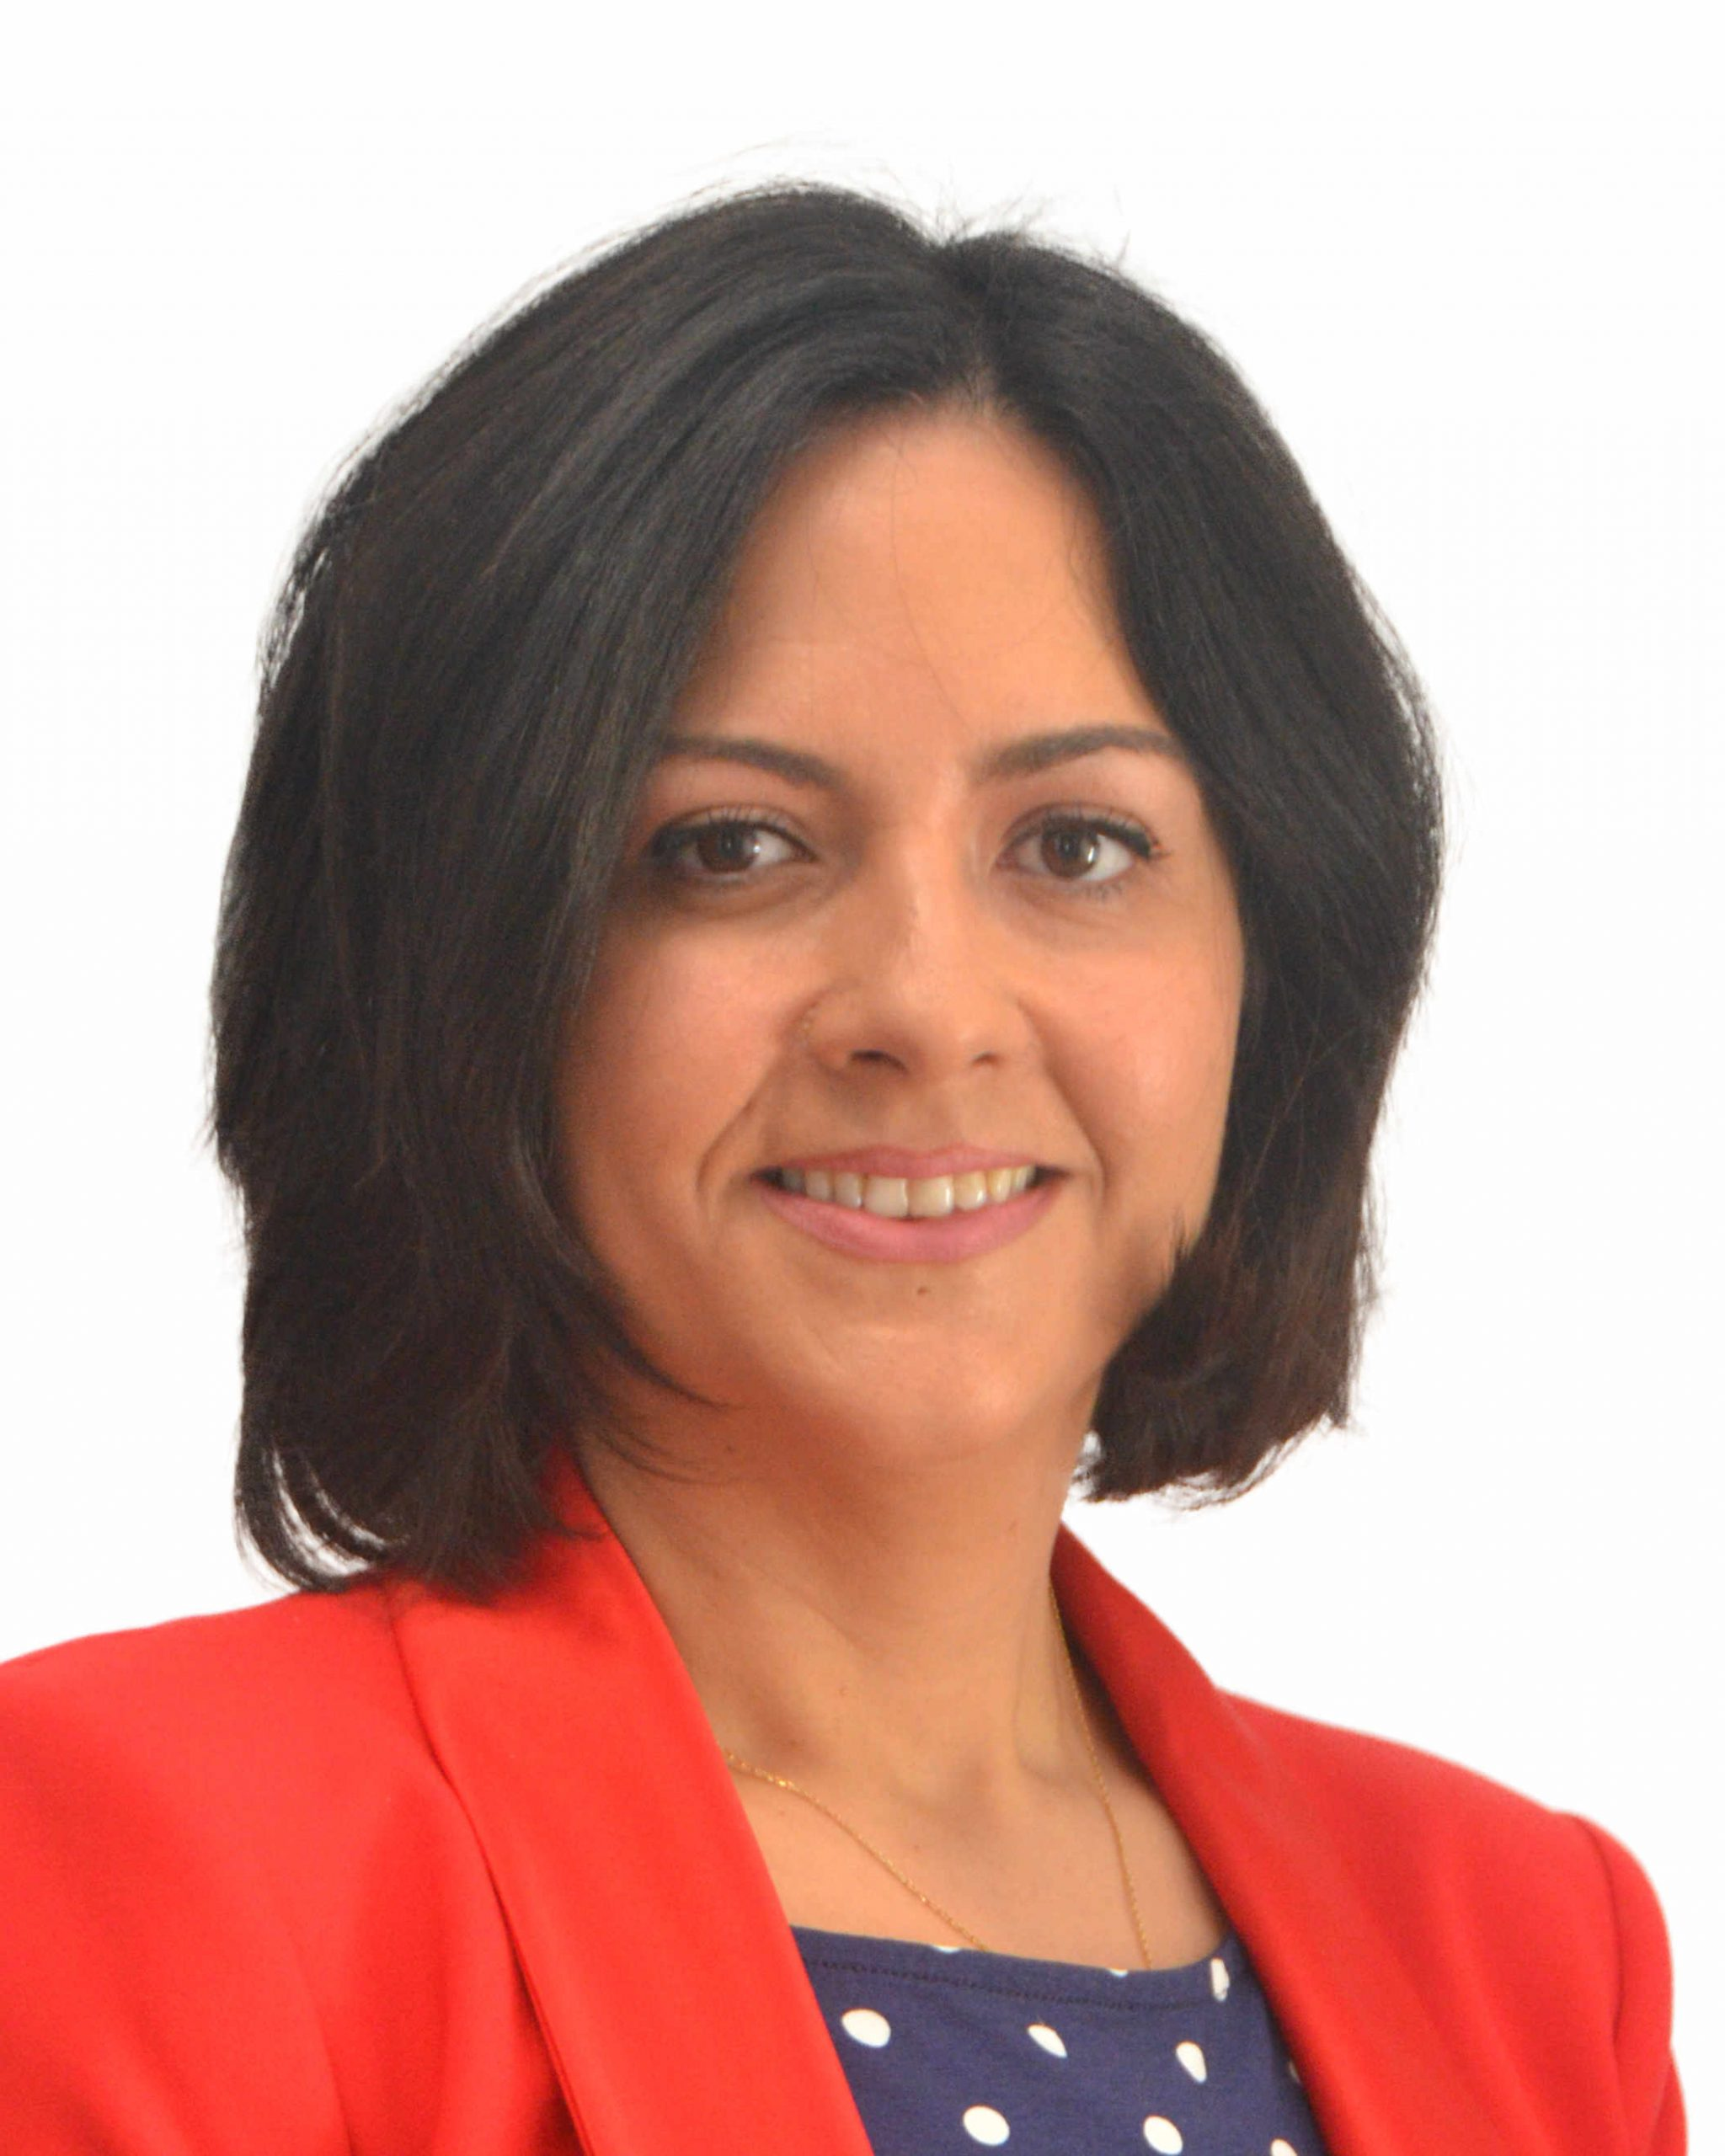 Ana Isabel Lazo Córdoba